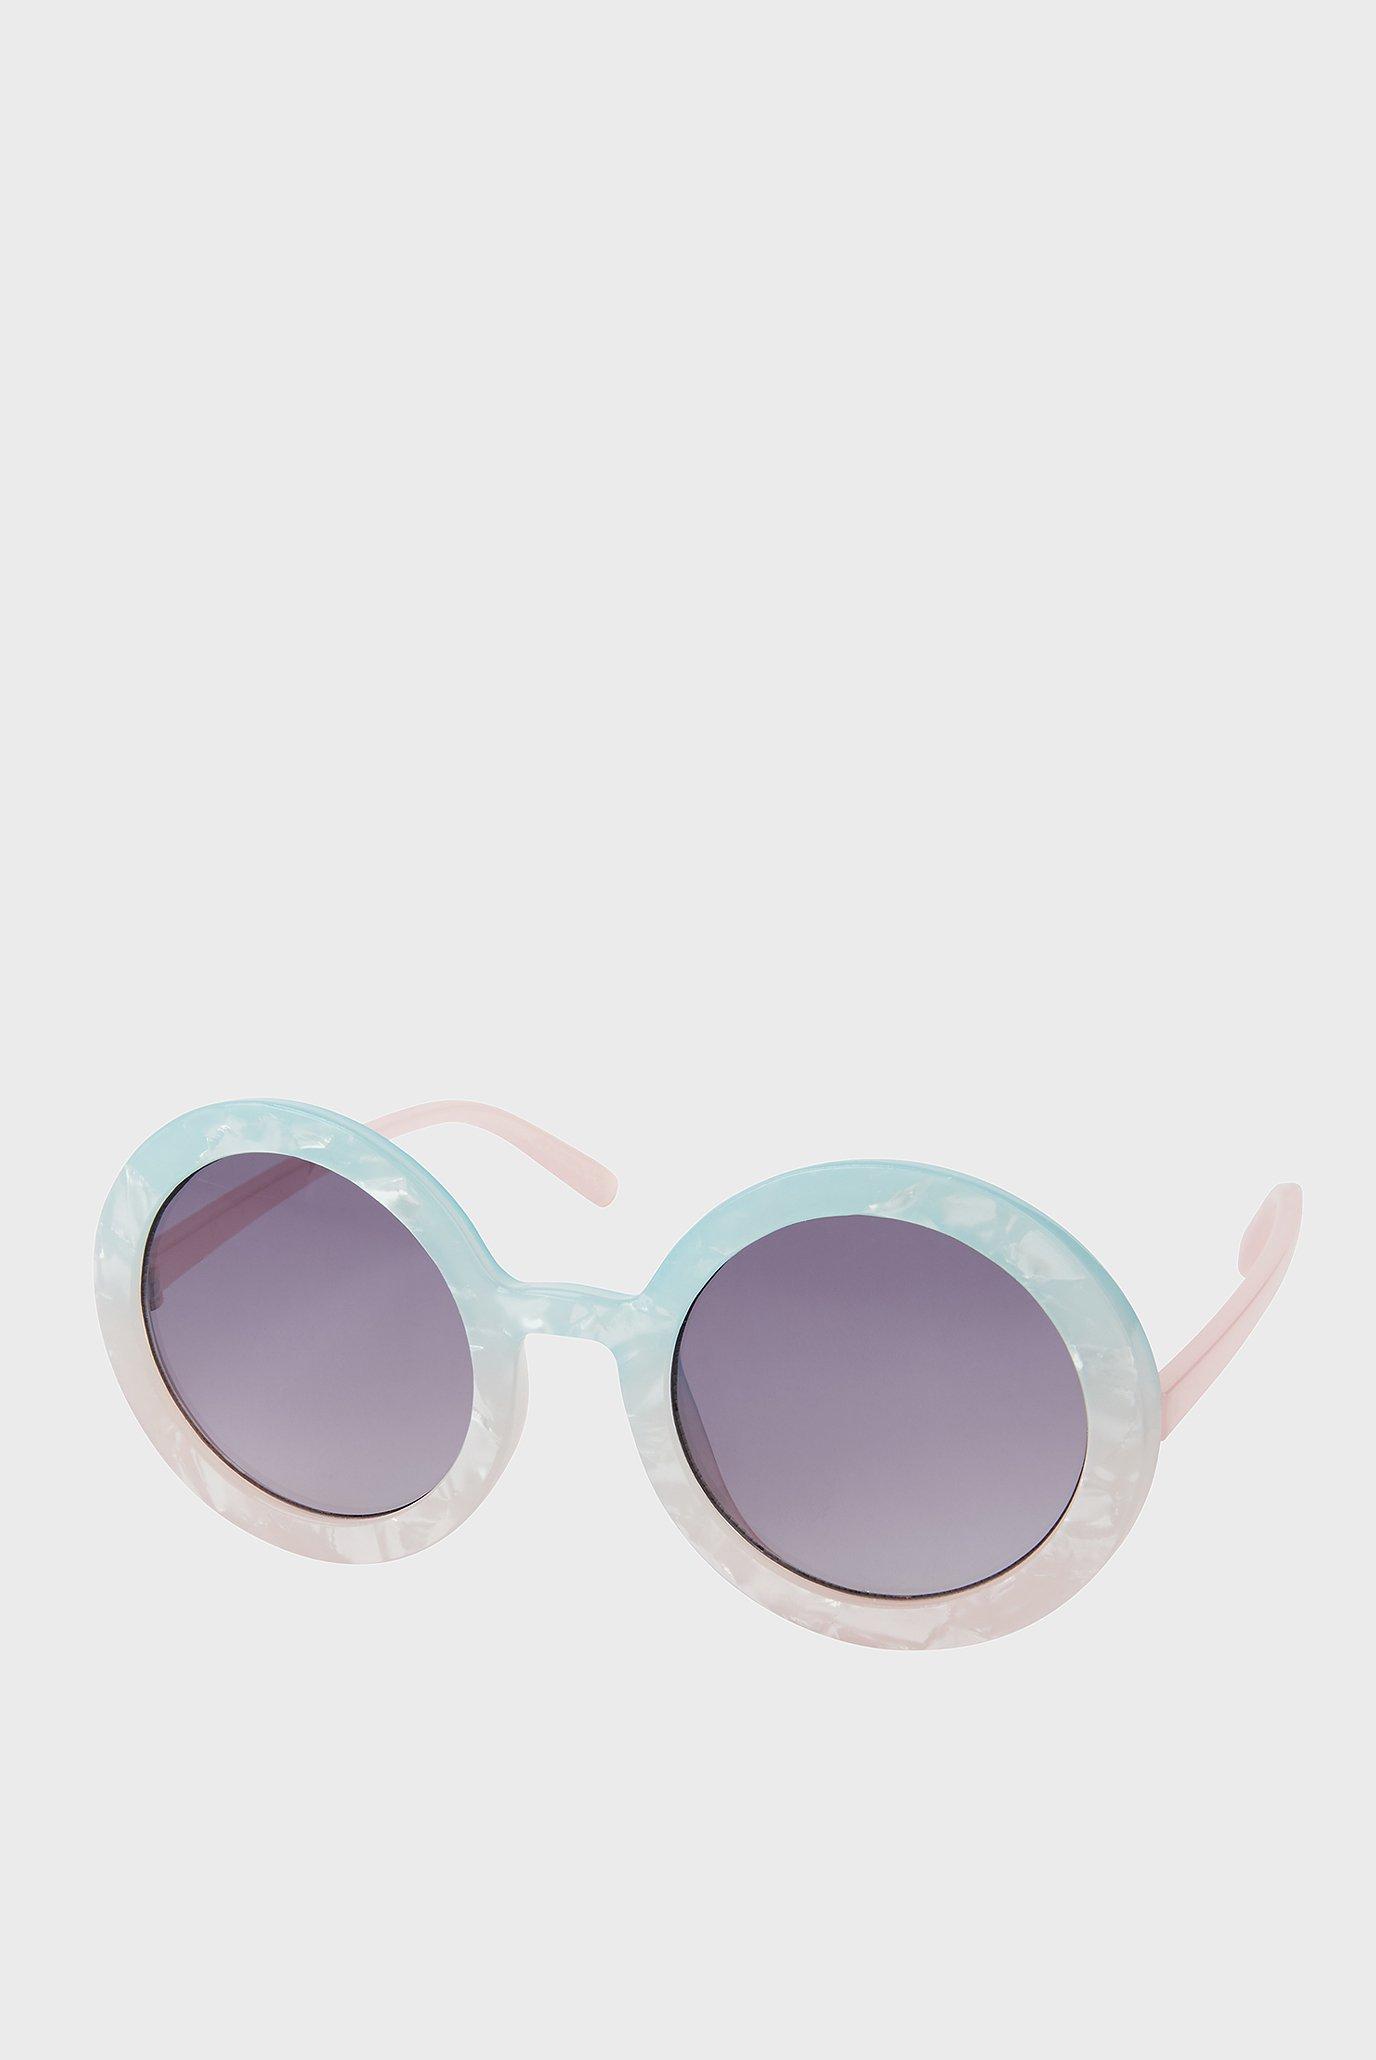 Сонцезахисні окуляри OMBRE ROUND SUNGLASS 1